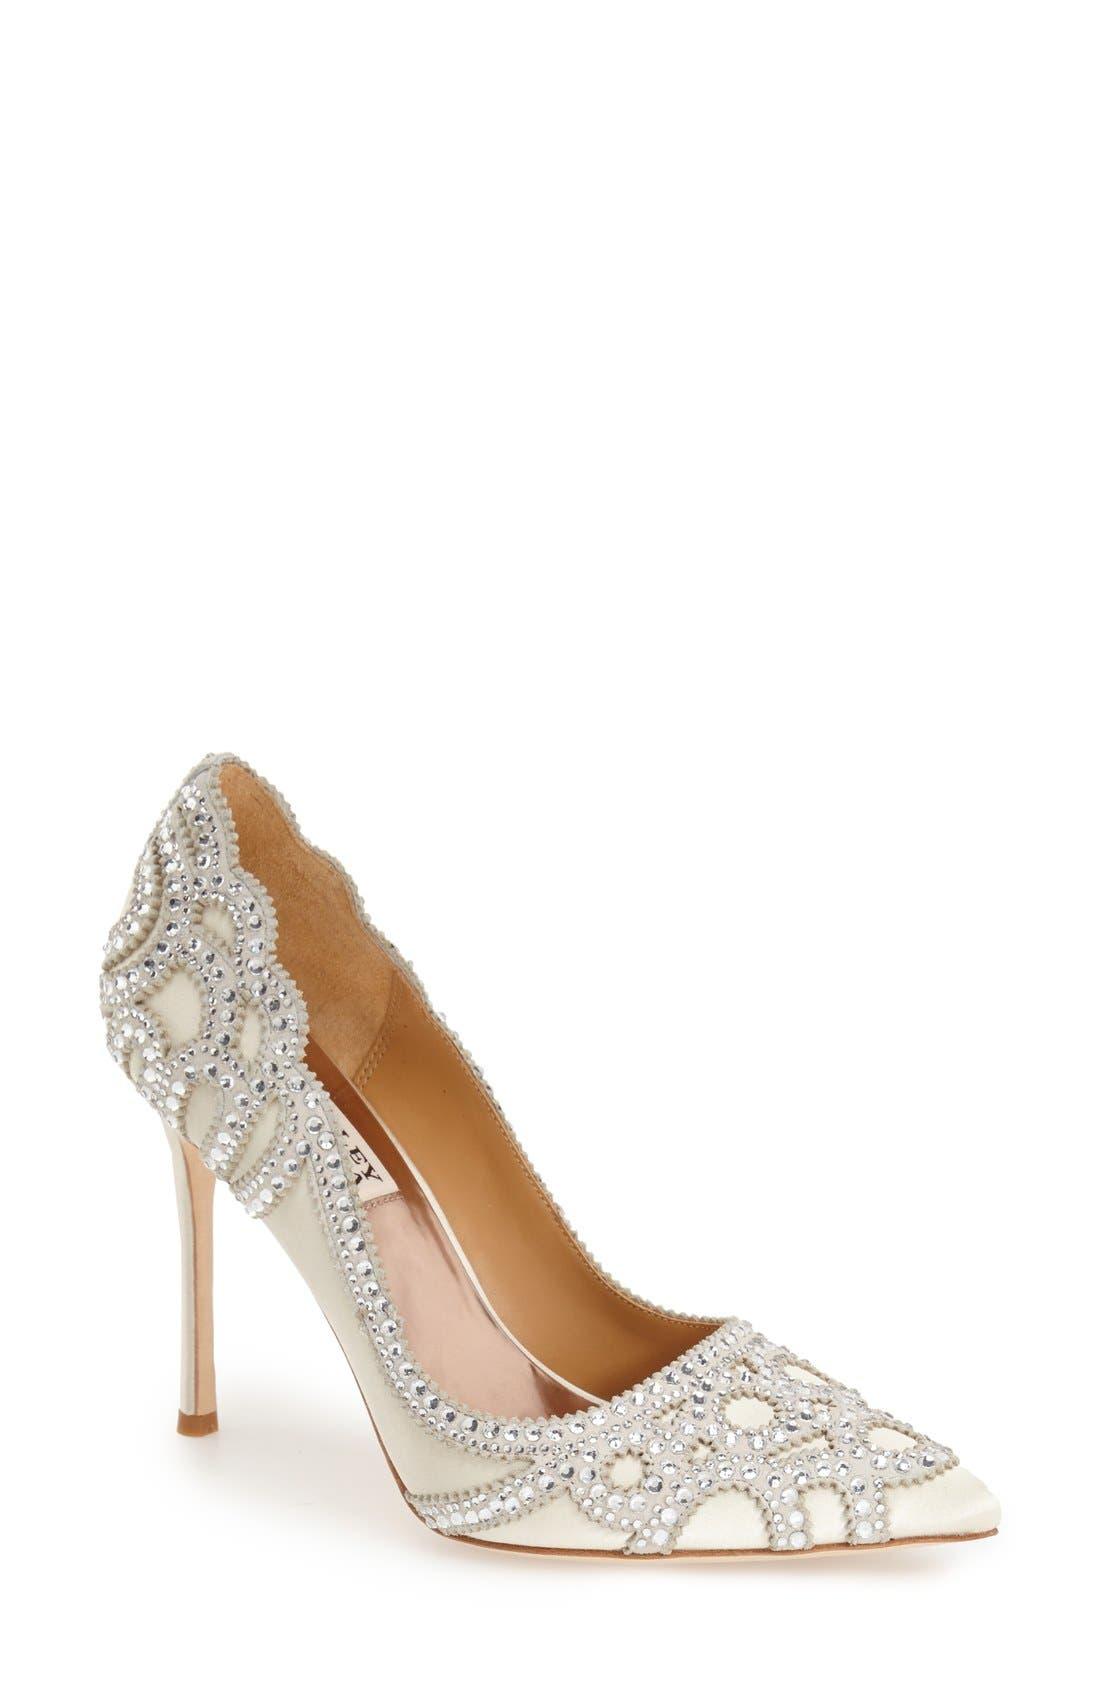 4630406538bf Badgley Mischka Women s Shoes